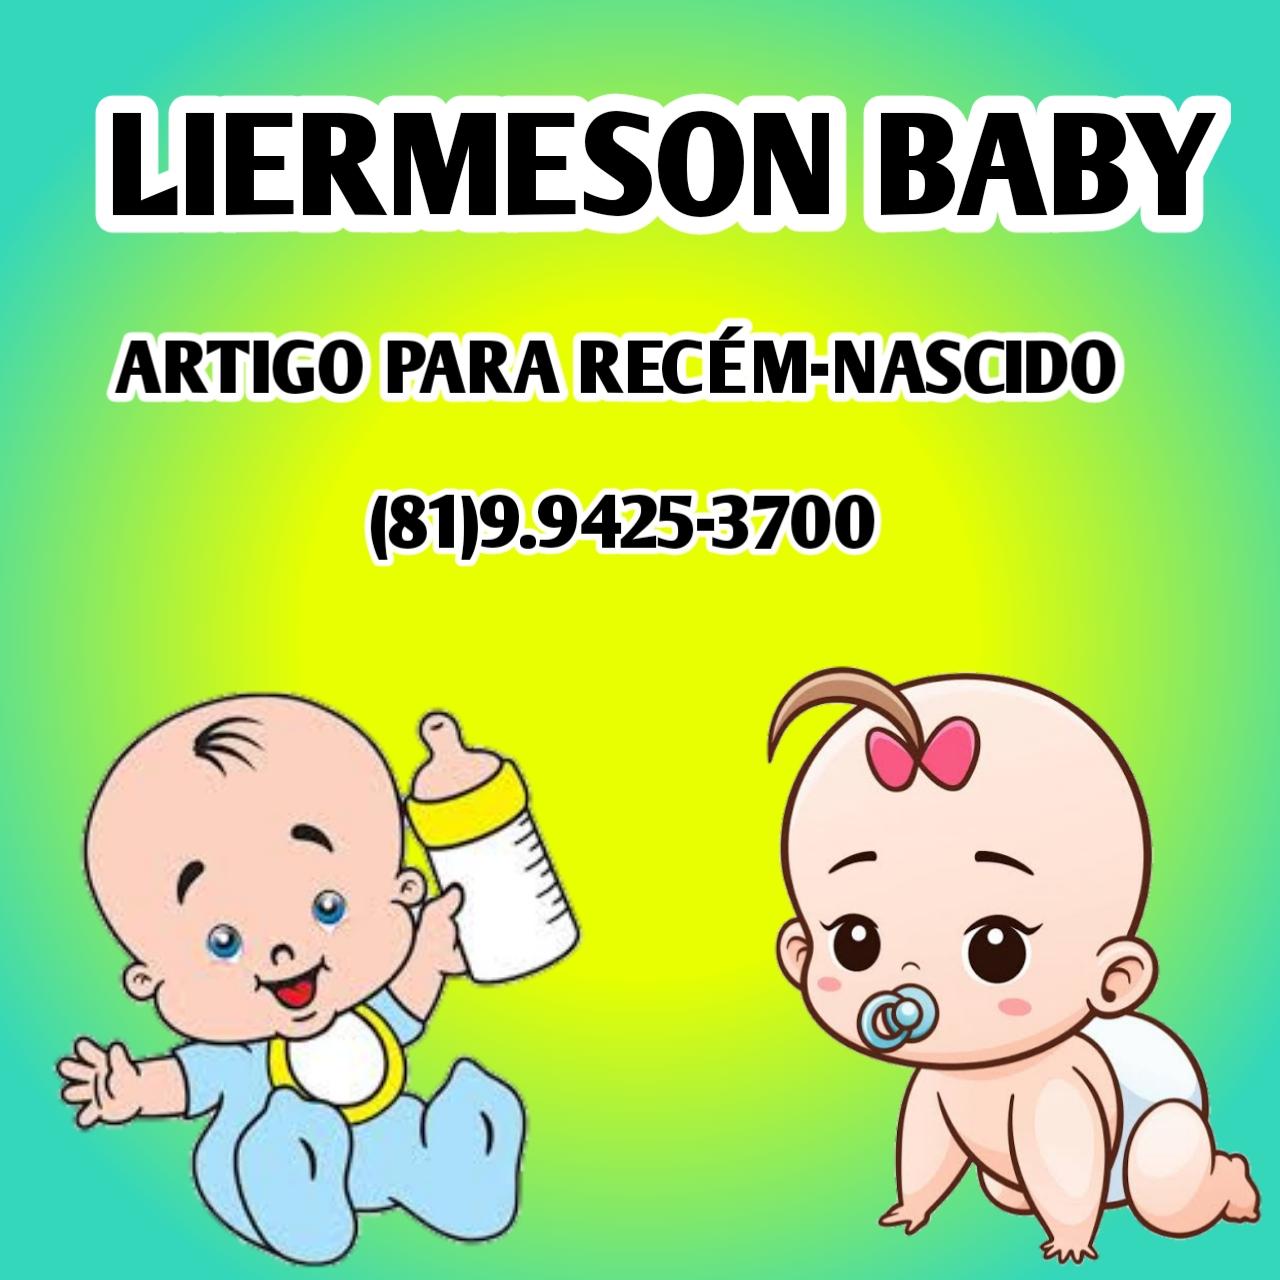 Liermeson Baby